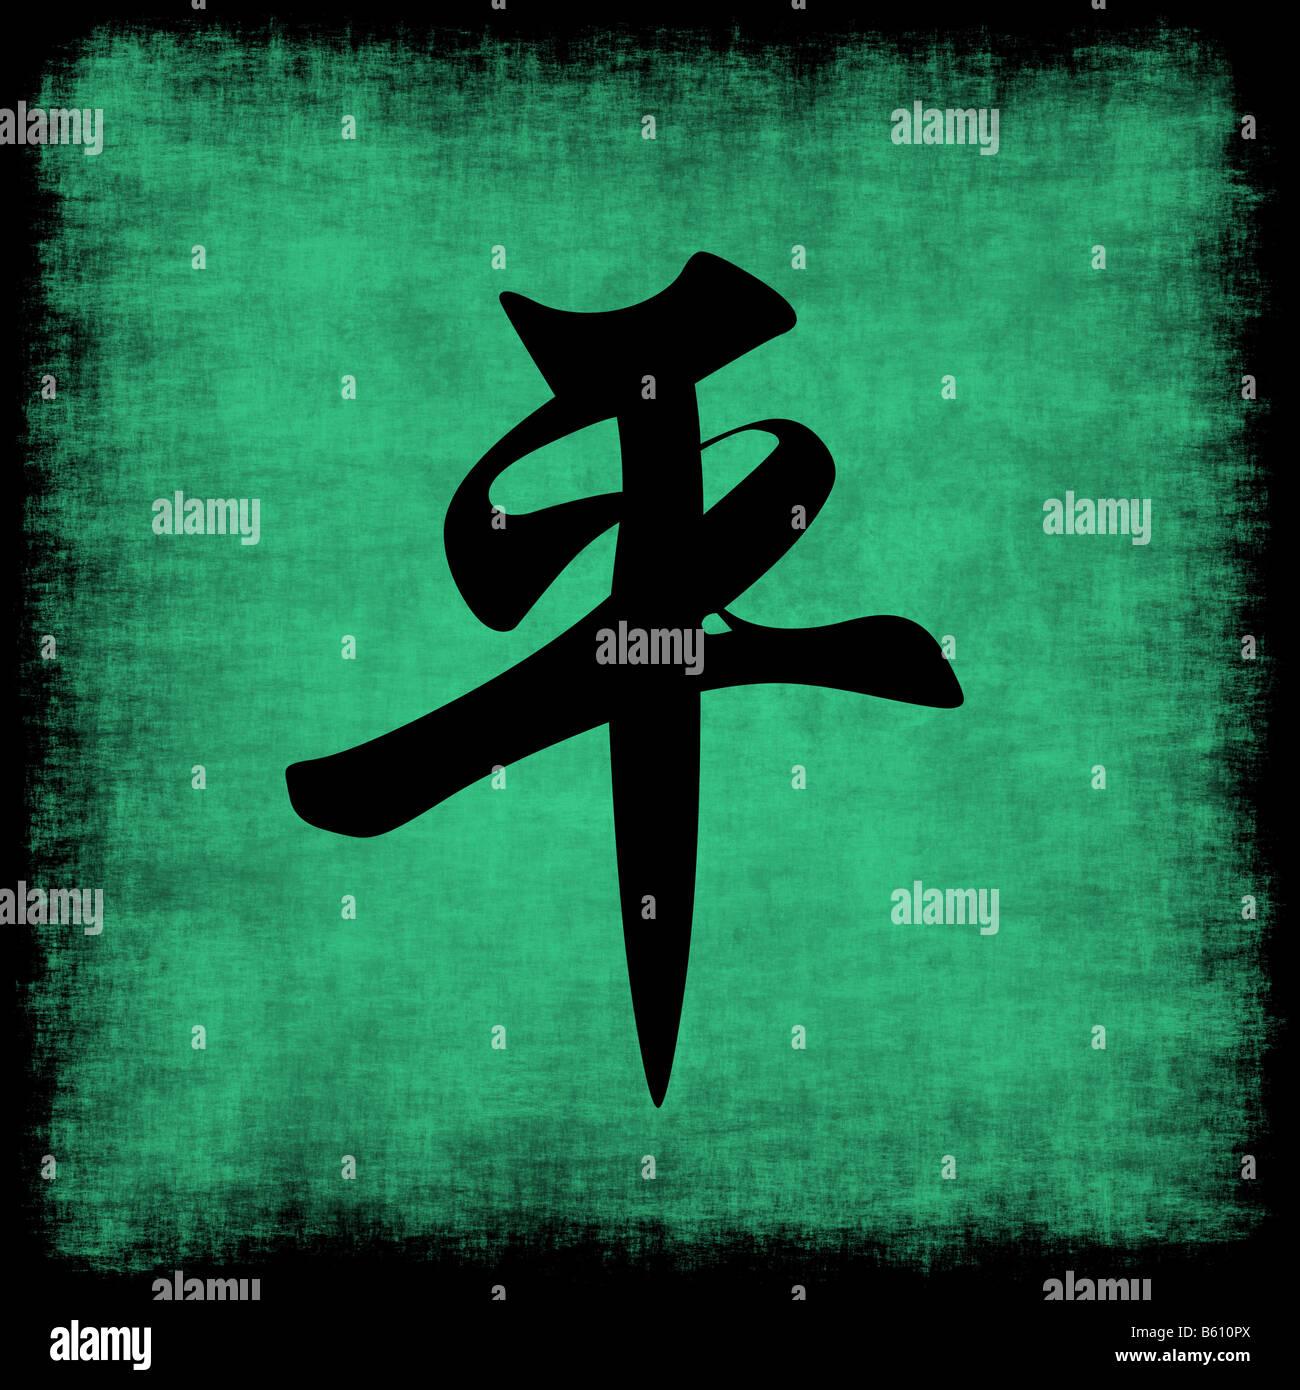 Peace chinese calligraphy symbol grunge background set stock photo peace chinese calligraphy symbol grunge background set buycottarizona Image collections